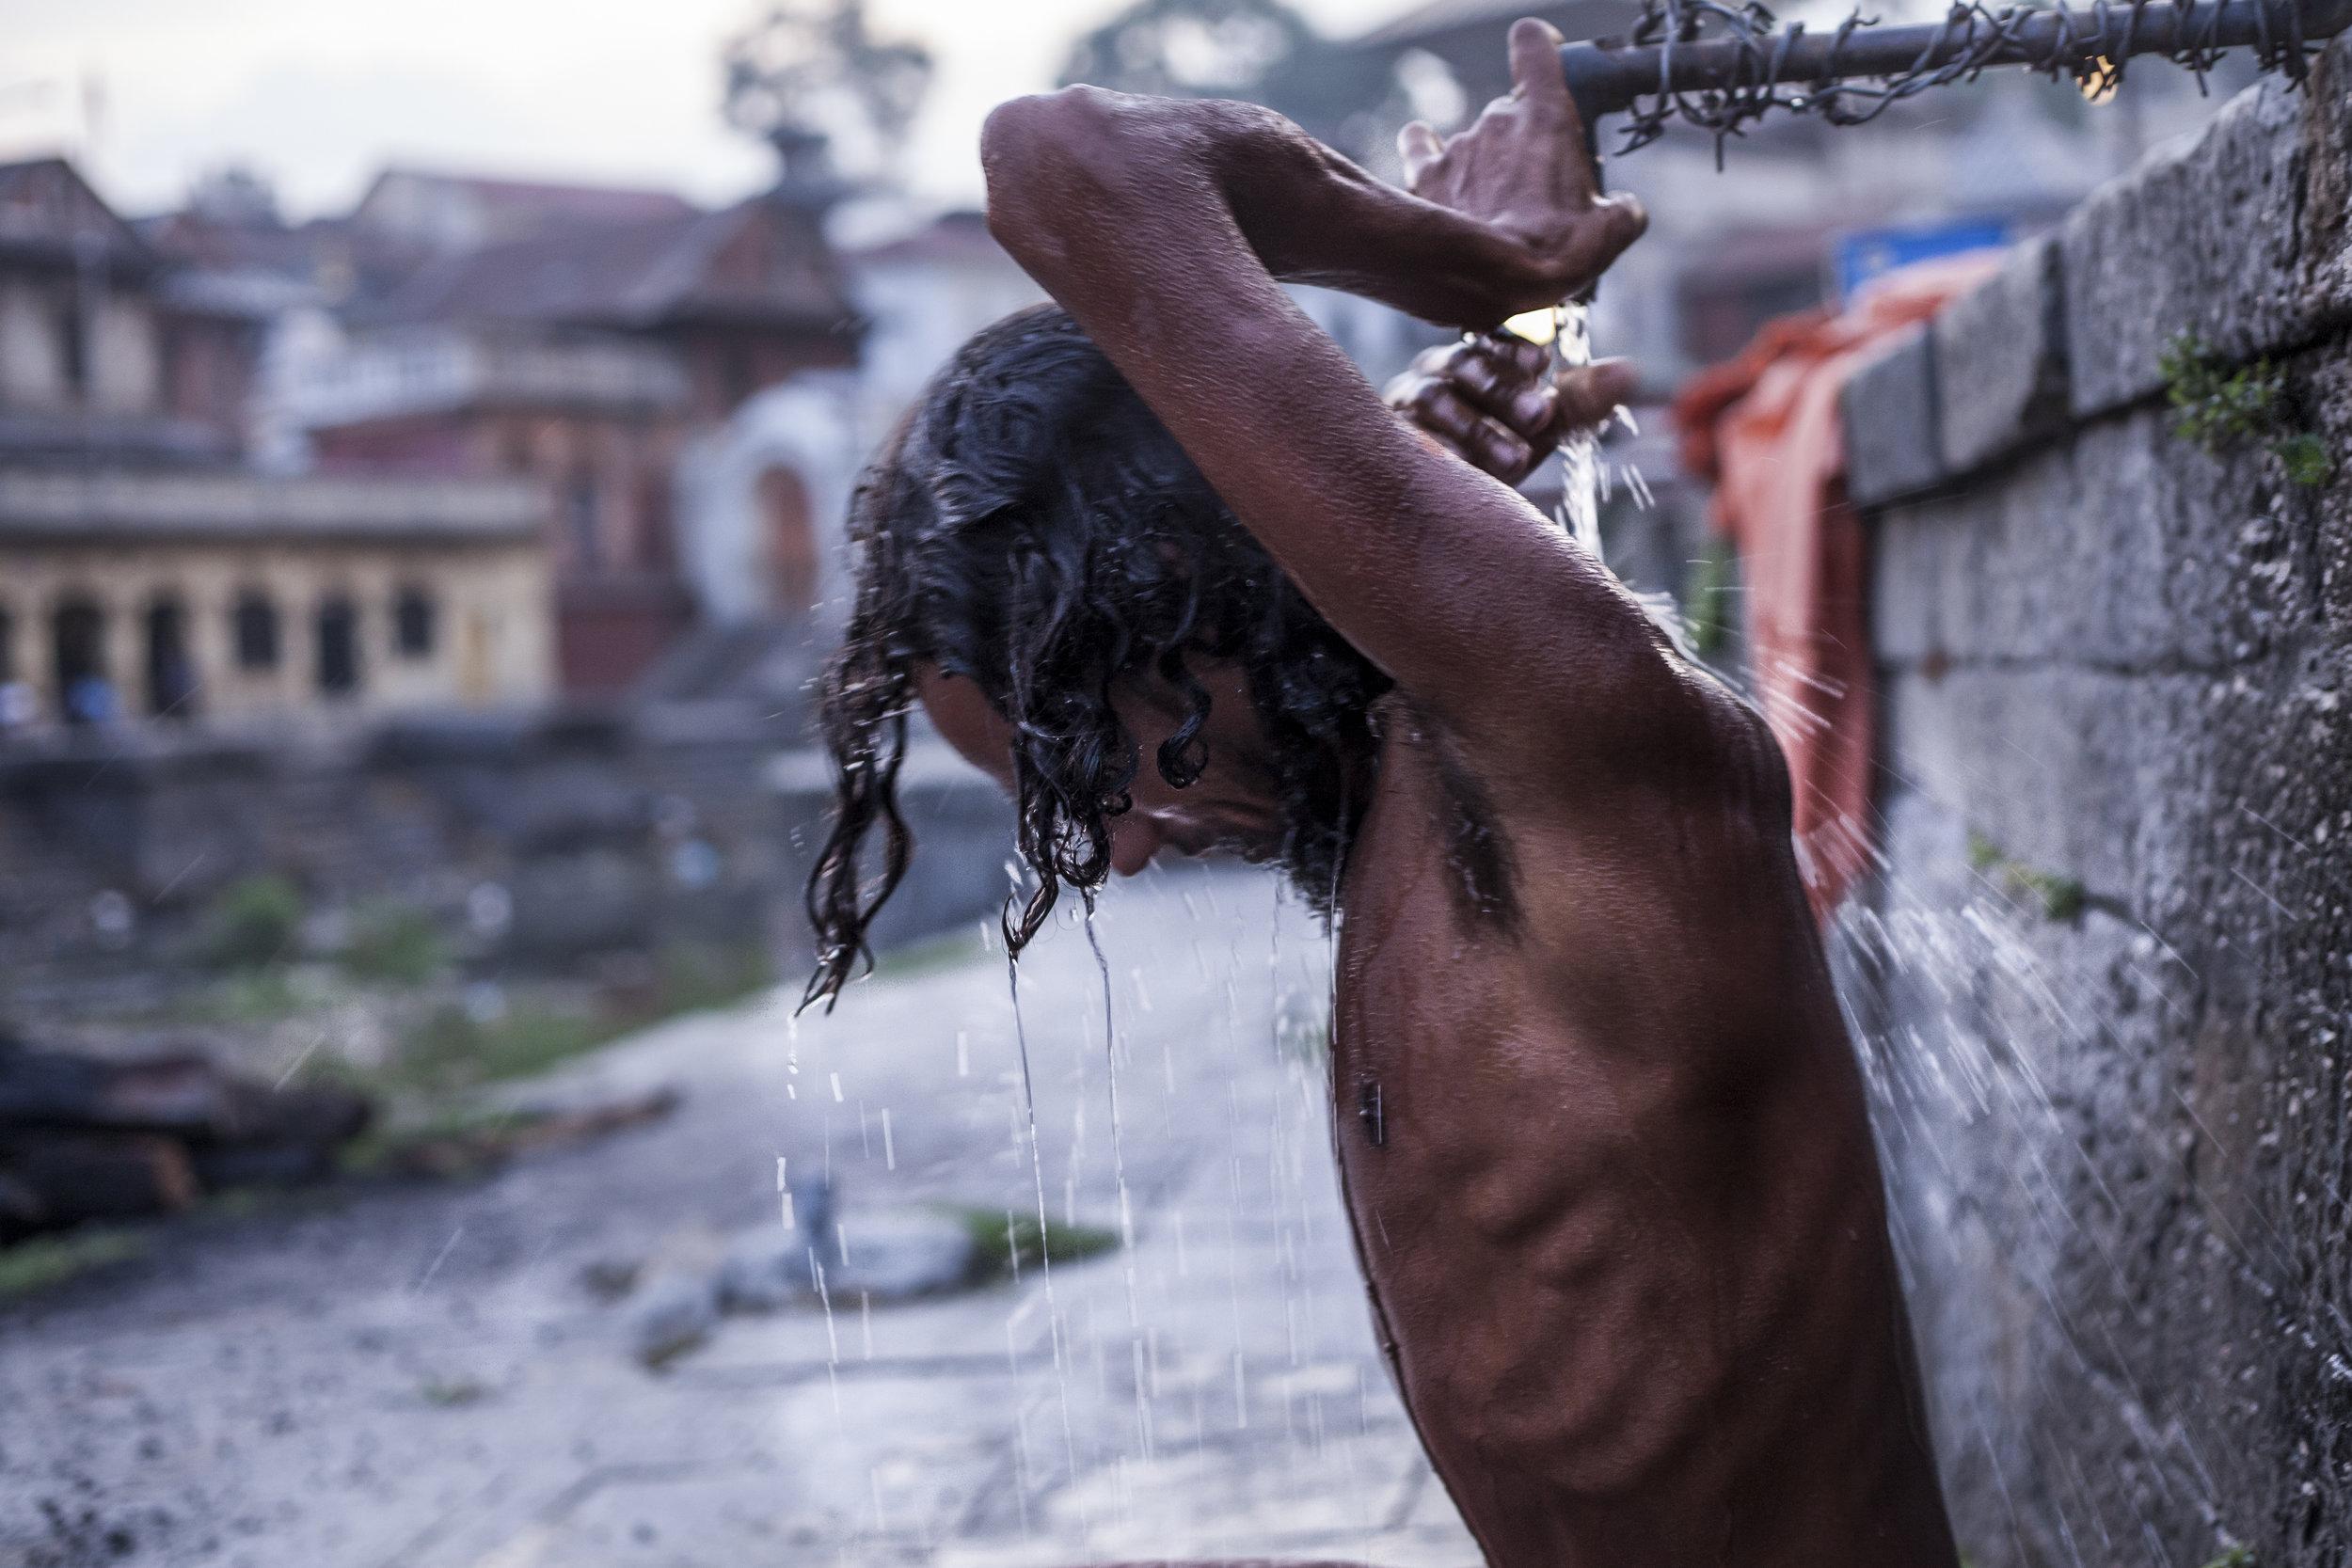 Reportage_Sadhus_Nepal_2012_16.jpg